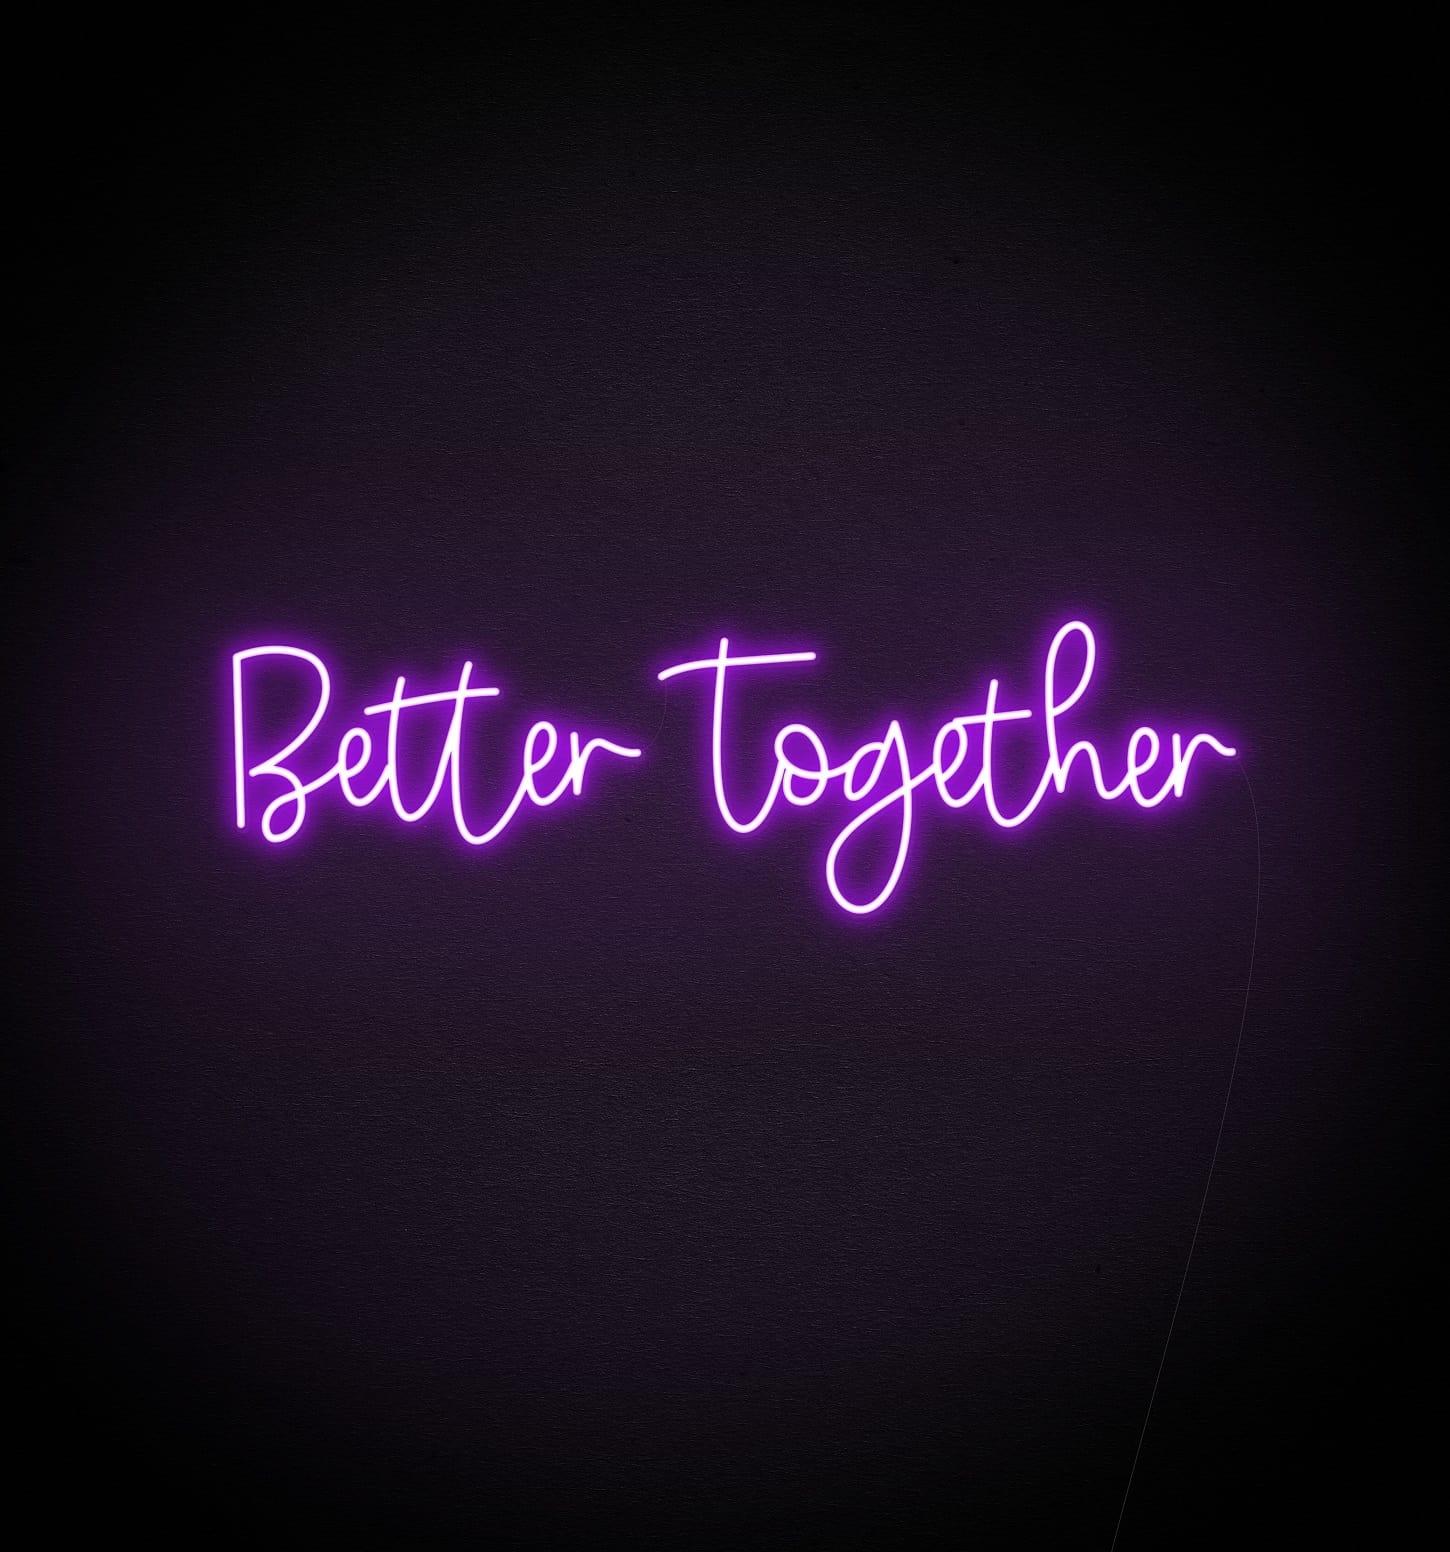 better together neon light